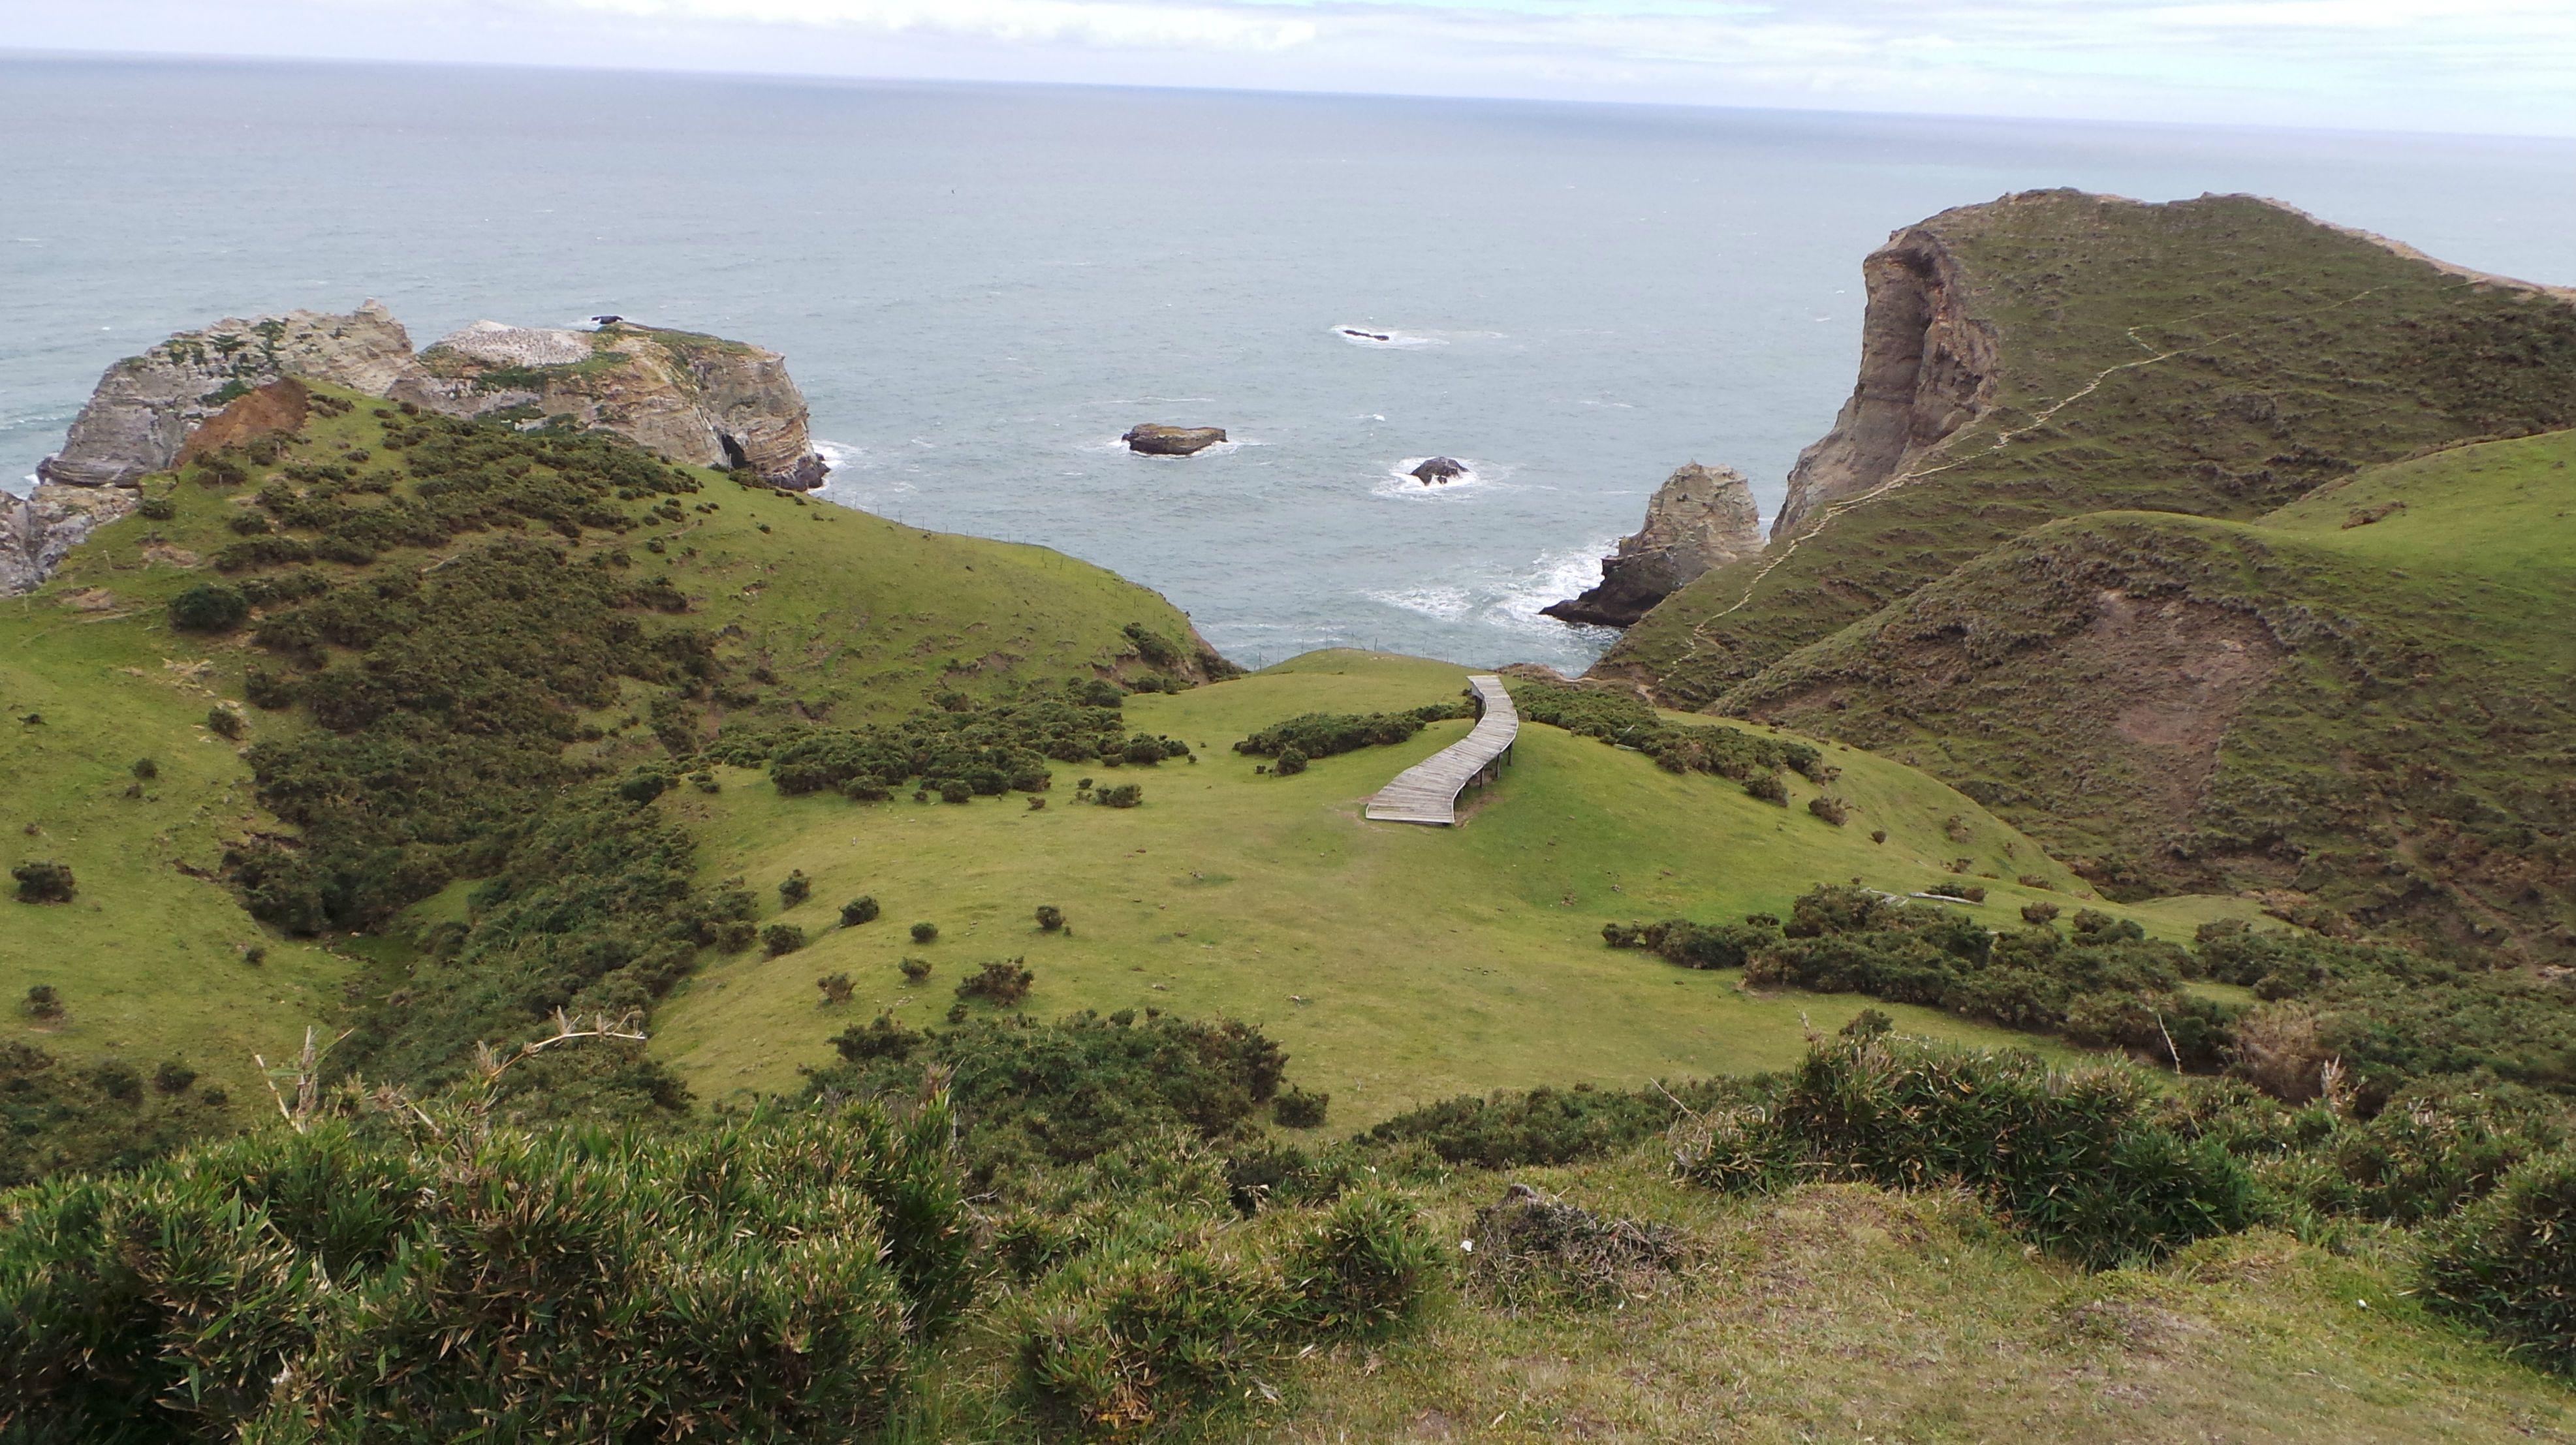 Chiloé tiene hermosos paisajes